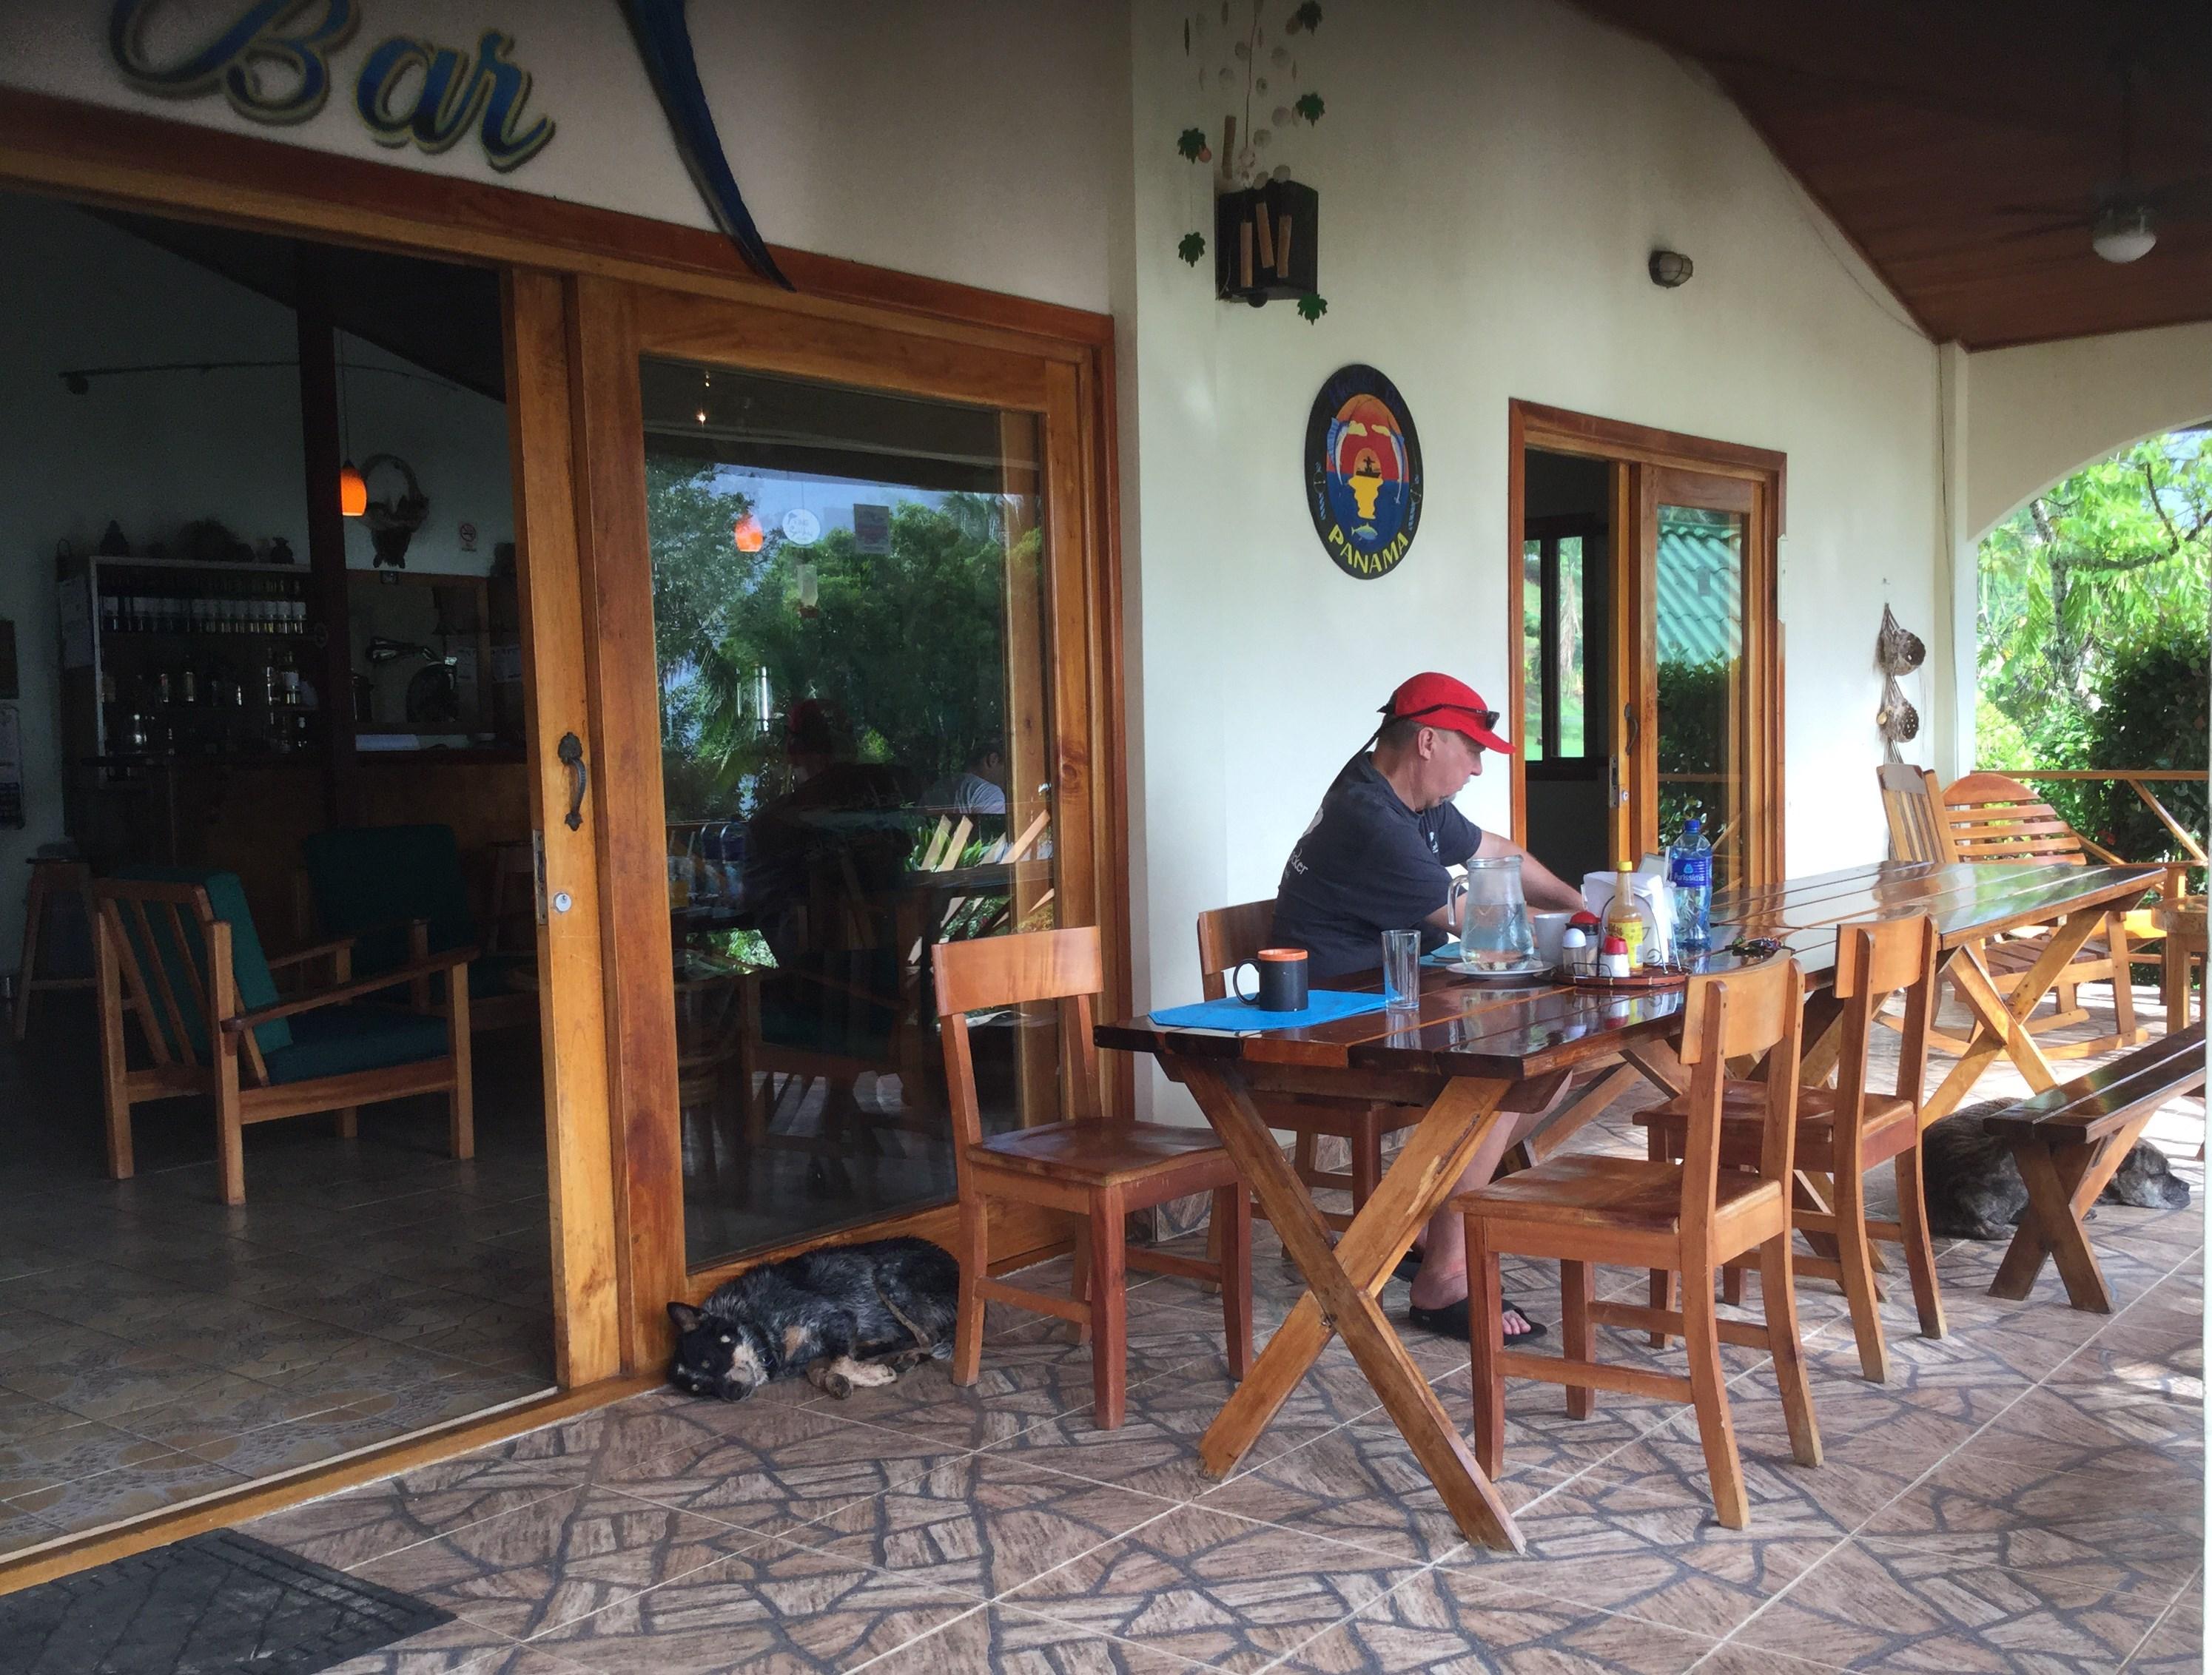 Hooked-on-Panama-Patio Doggy Bliss at Hooked on Panama Panama Pets